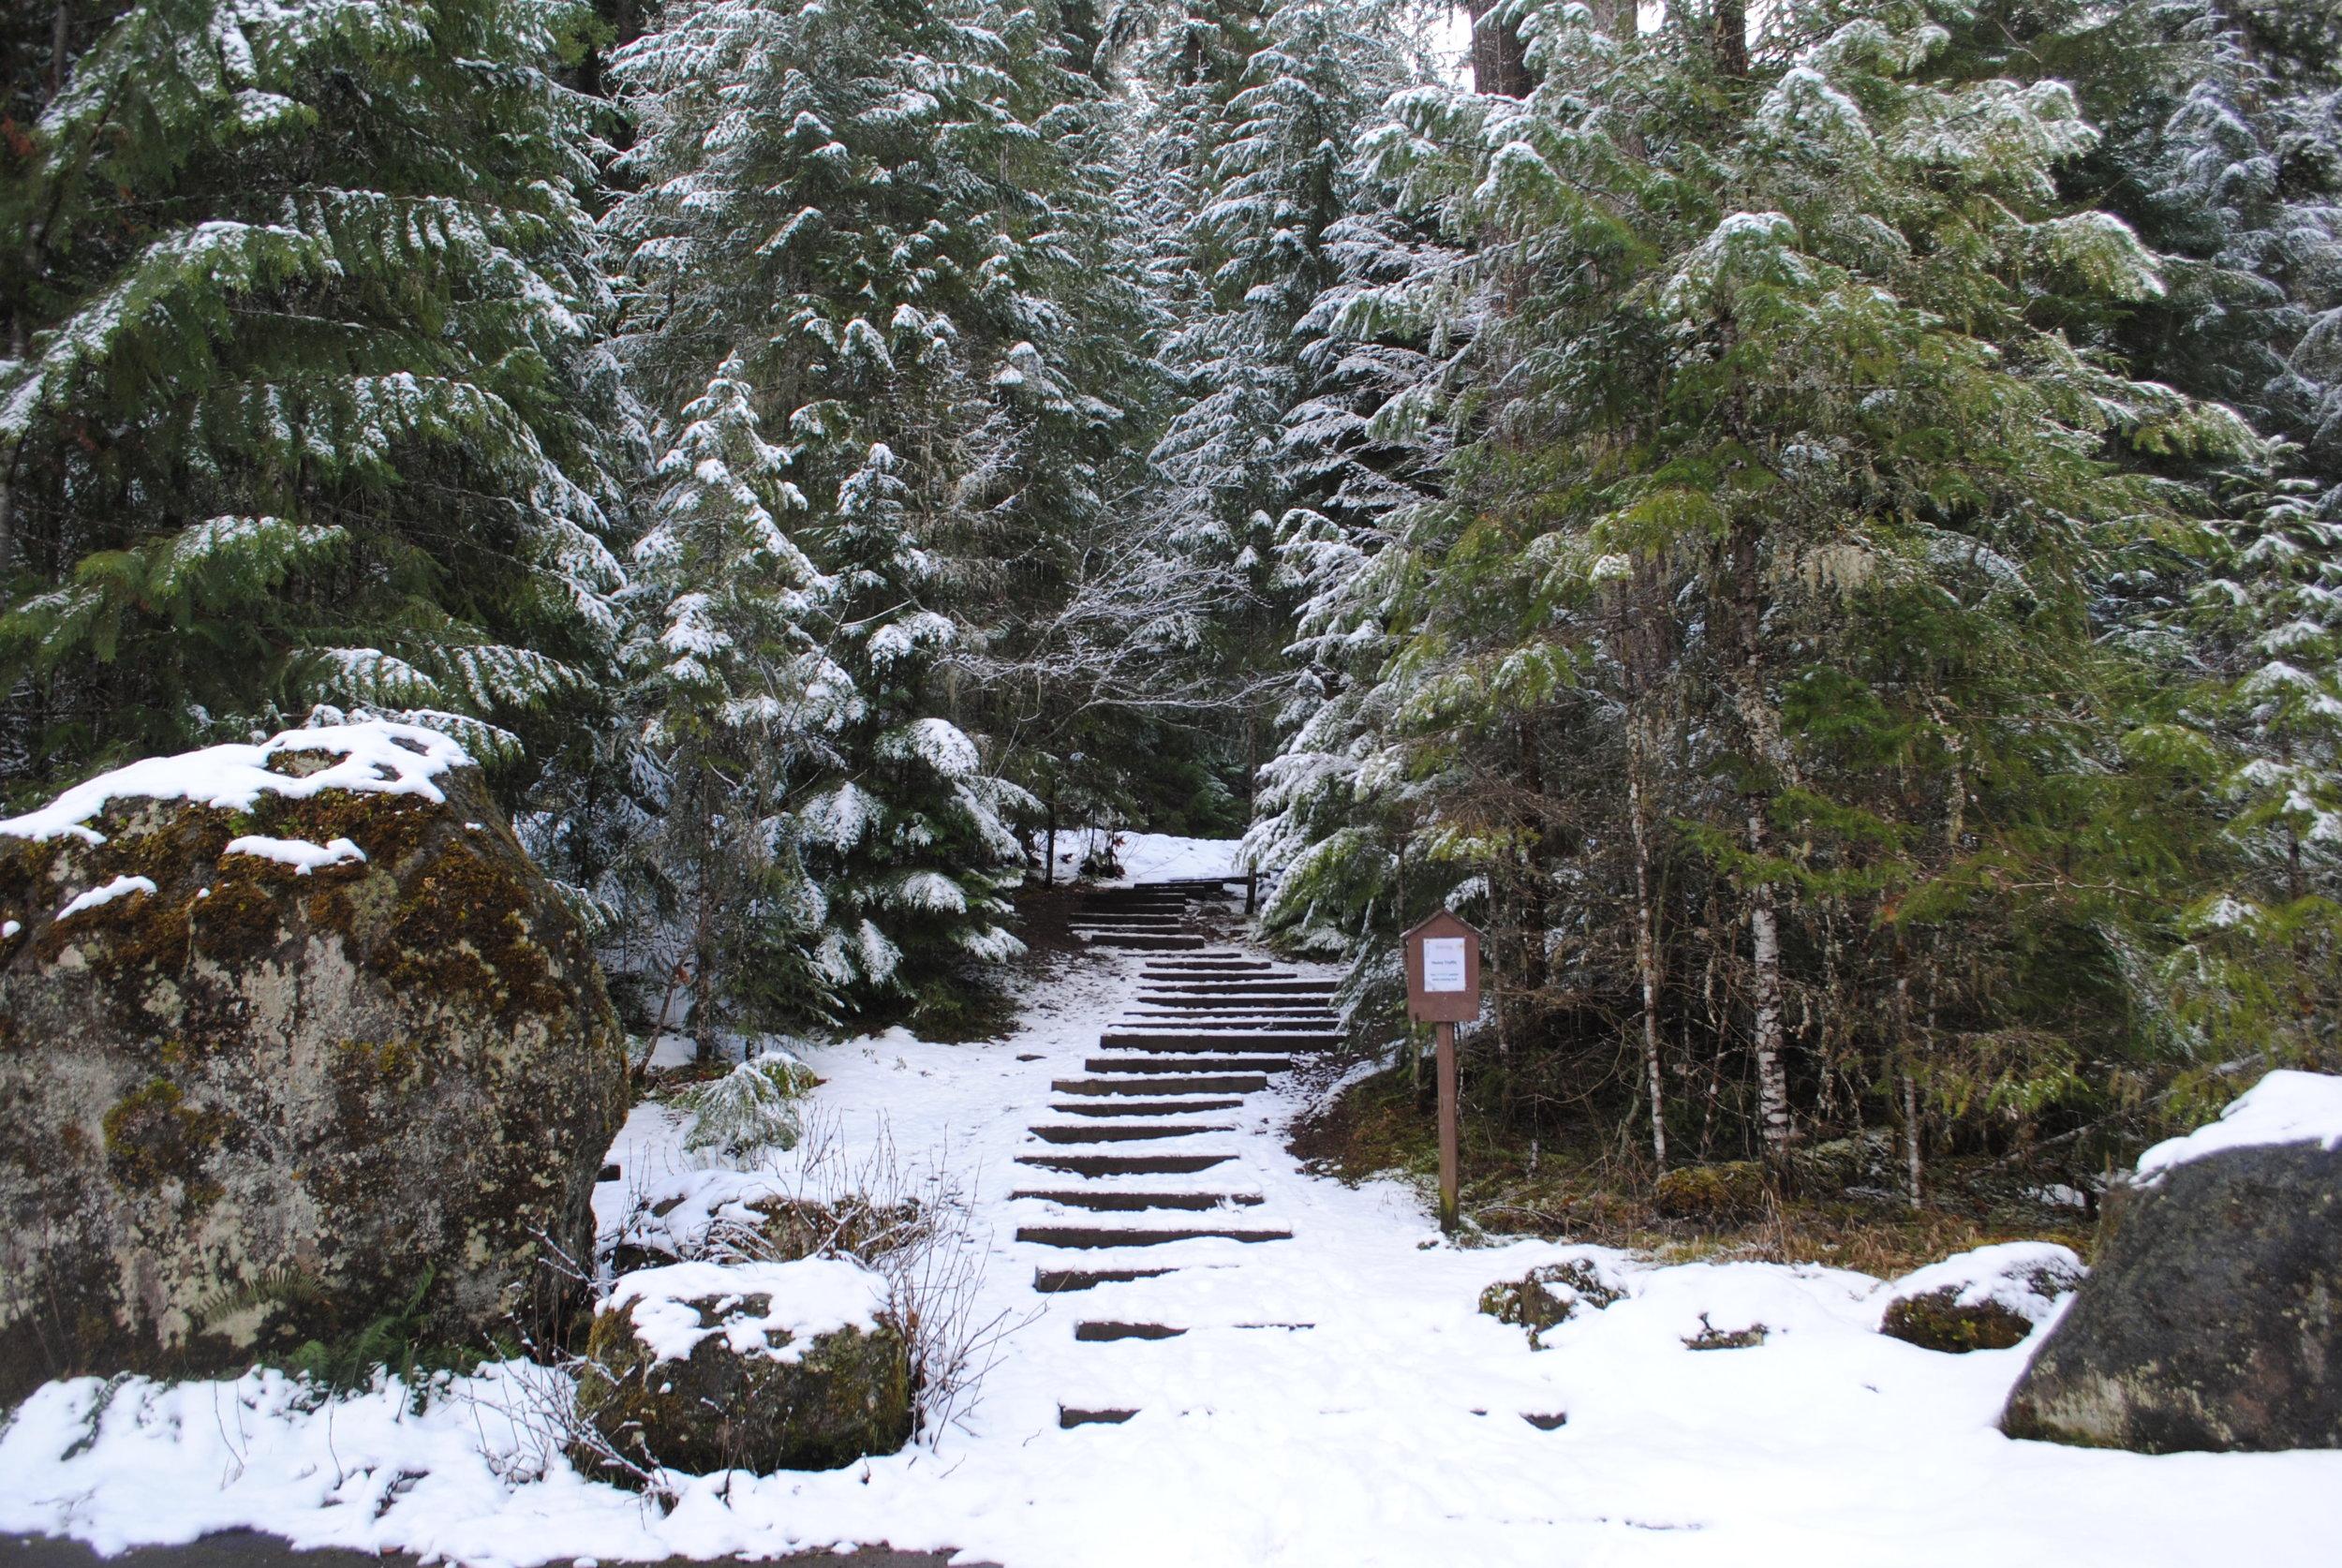 WATSON FALLS - What to do in Southern Oregon - Things to do in Roseburg - Diamond Lake - Waterfalls